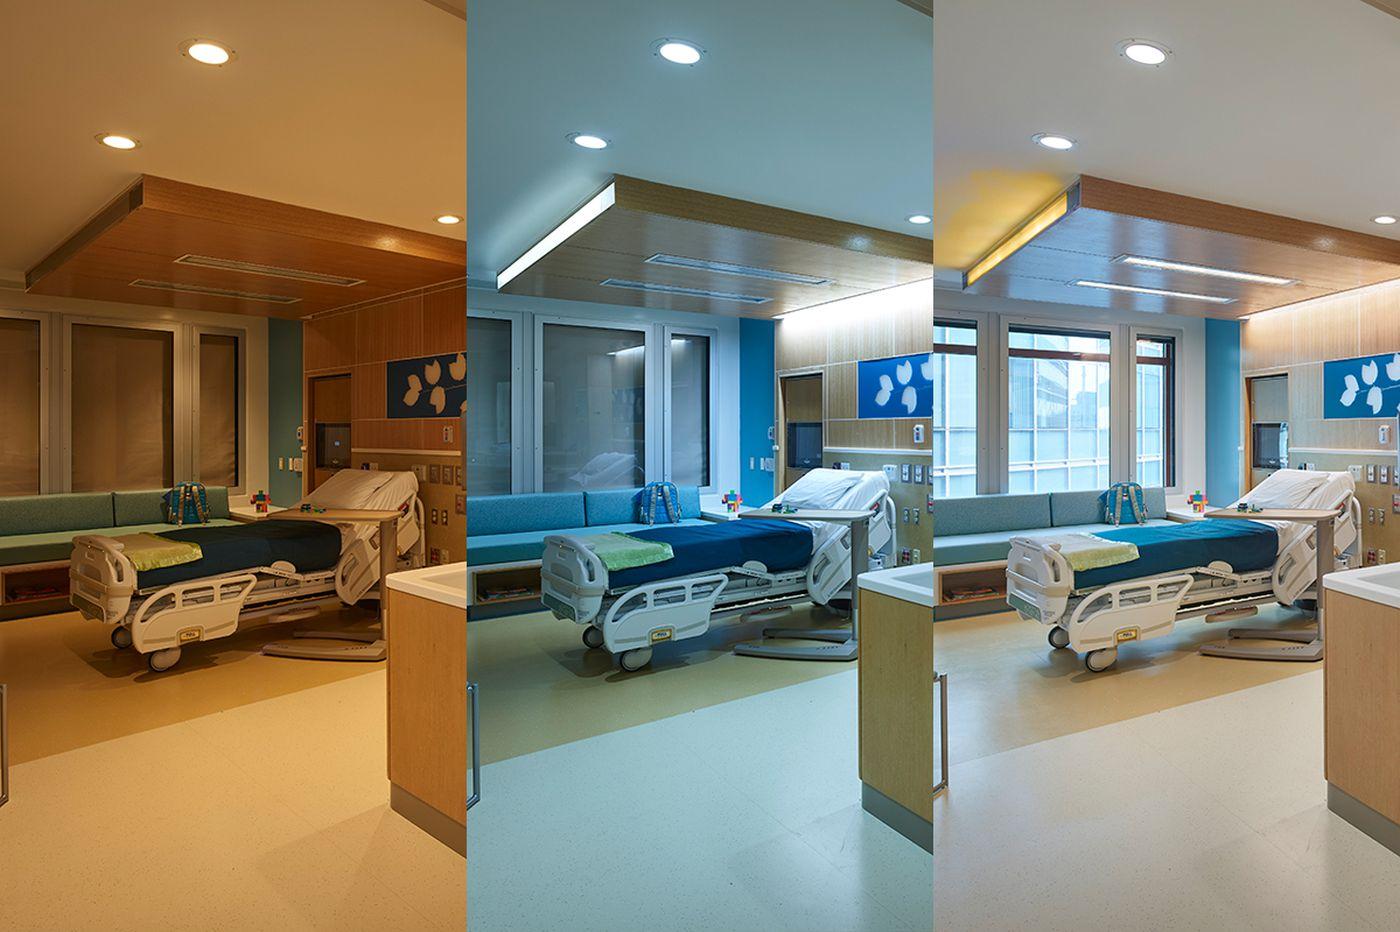 Hospital Corridor Lighting Design: The Era Of Circadian Lighting In Health Care Is Dawning